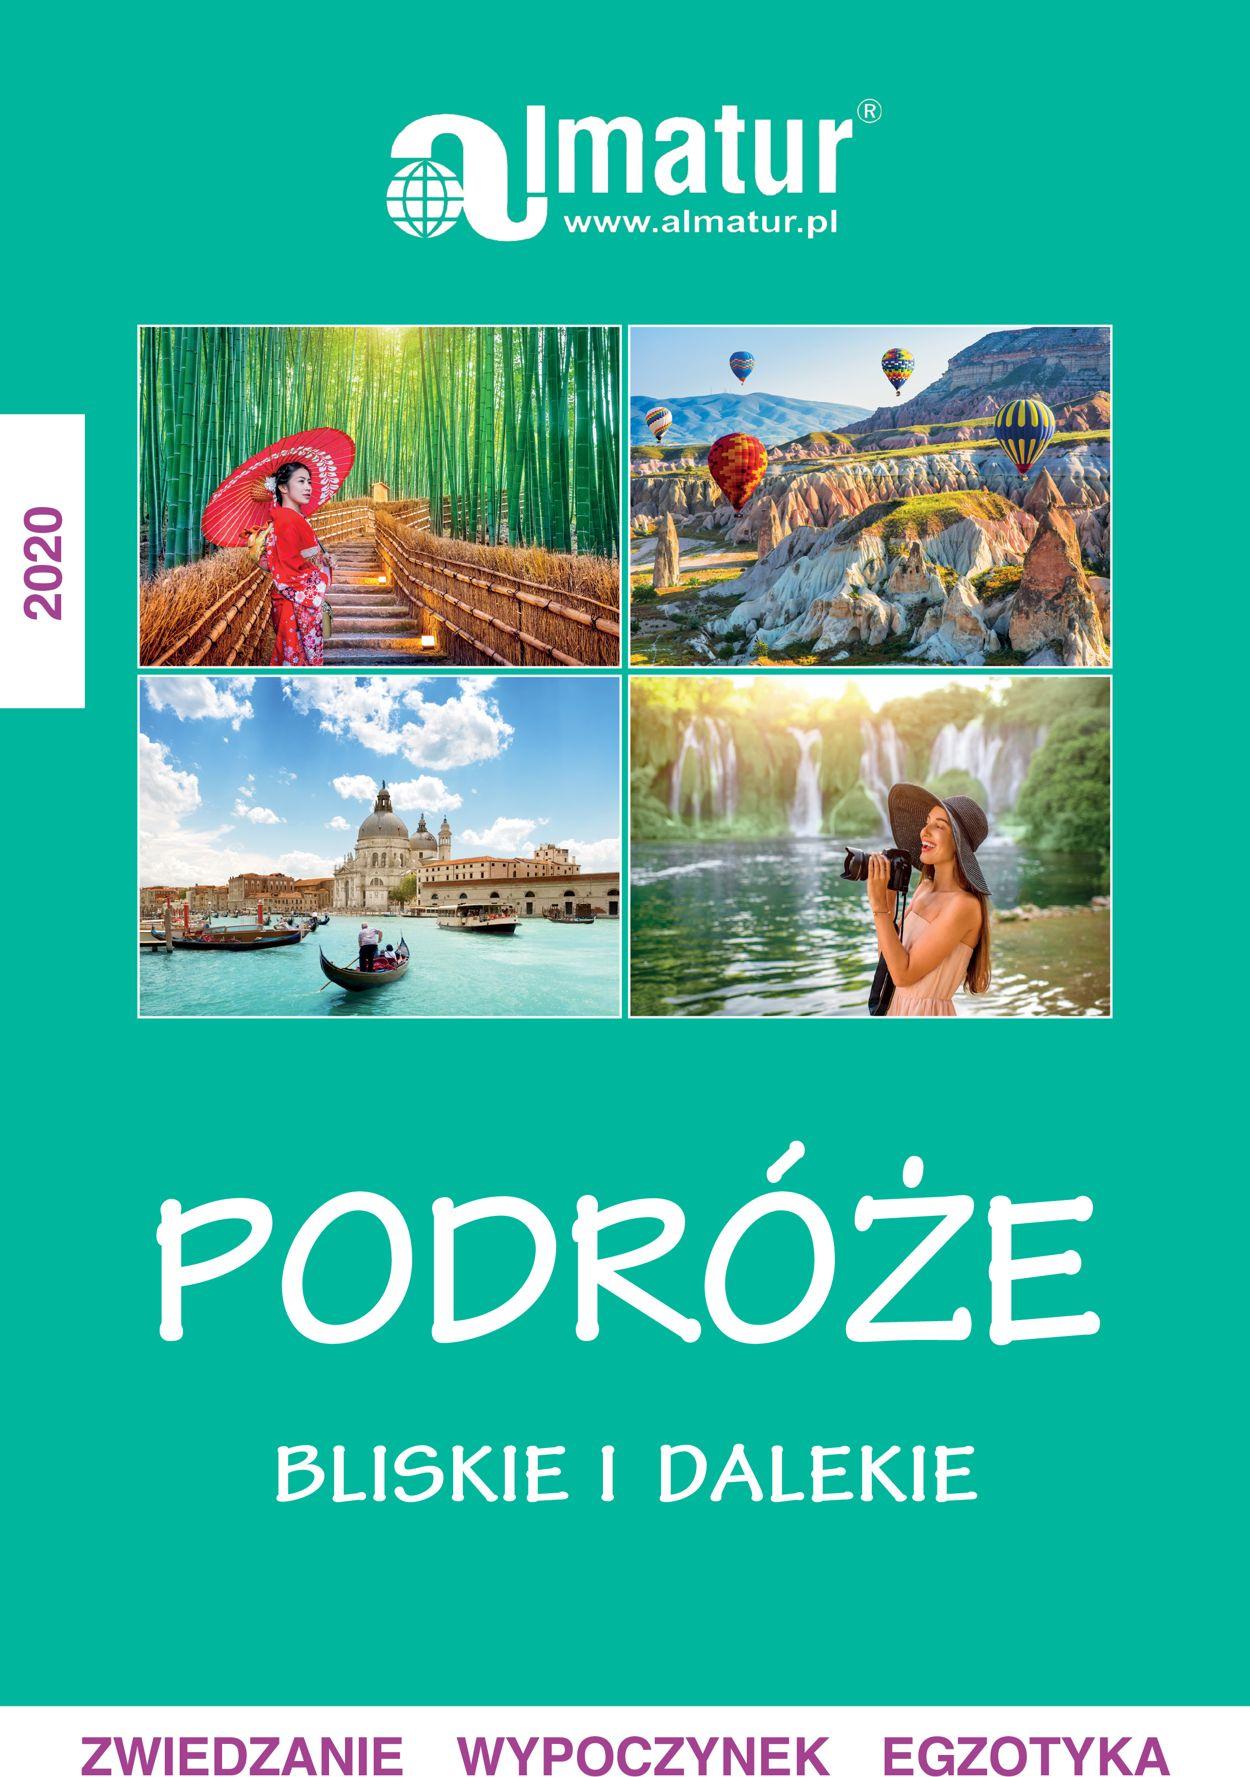 Gazetka promocyjna Almatur - 19.06-31.12.2020